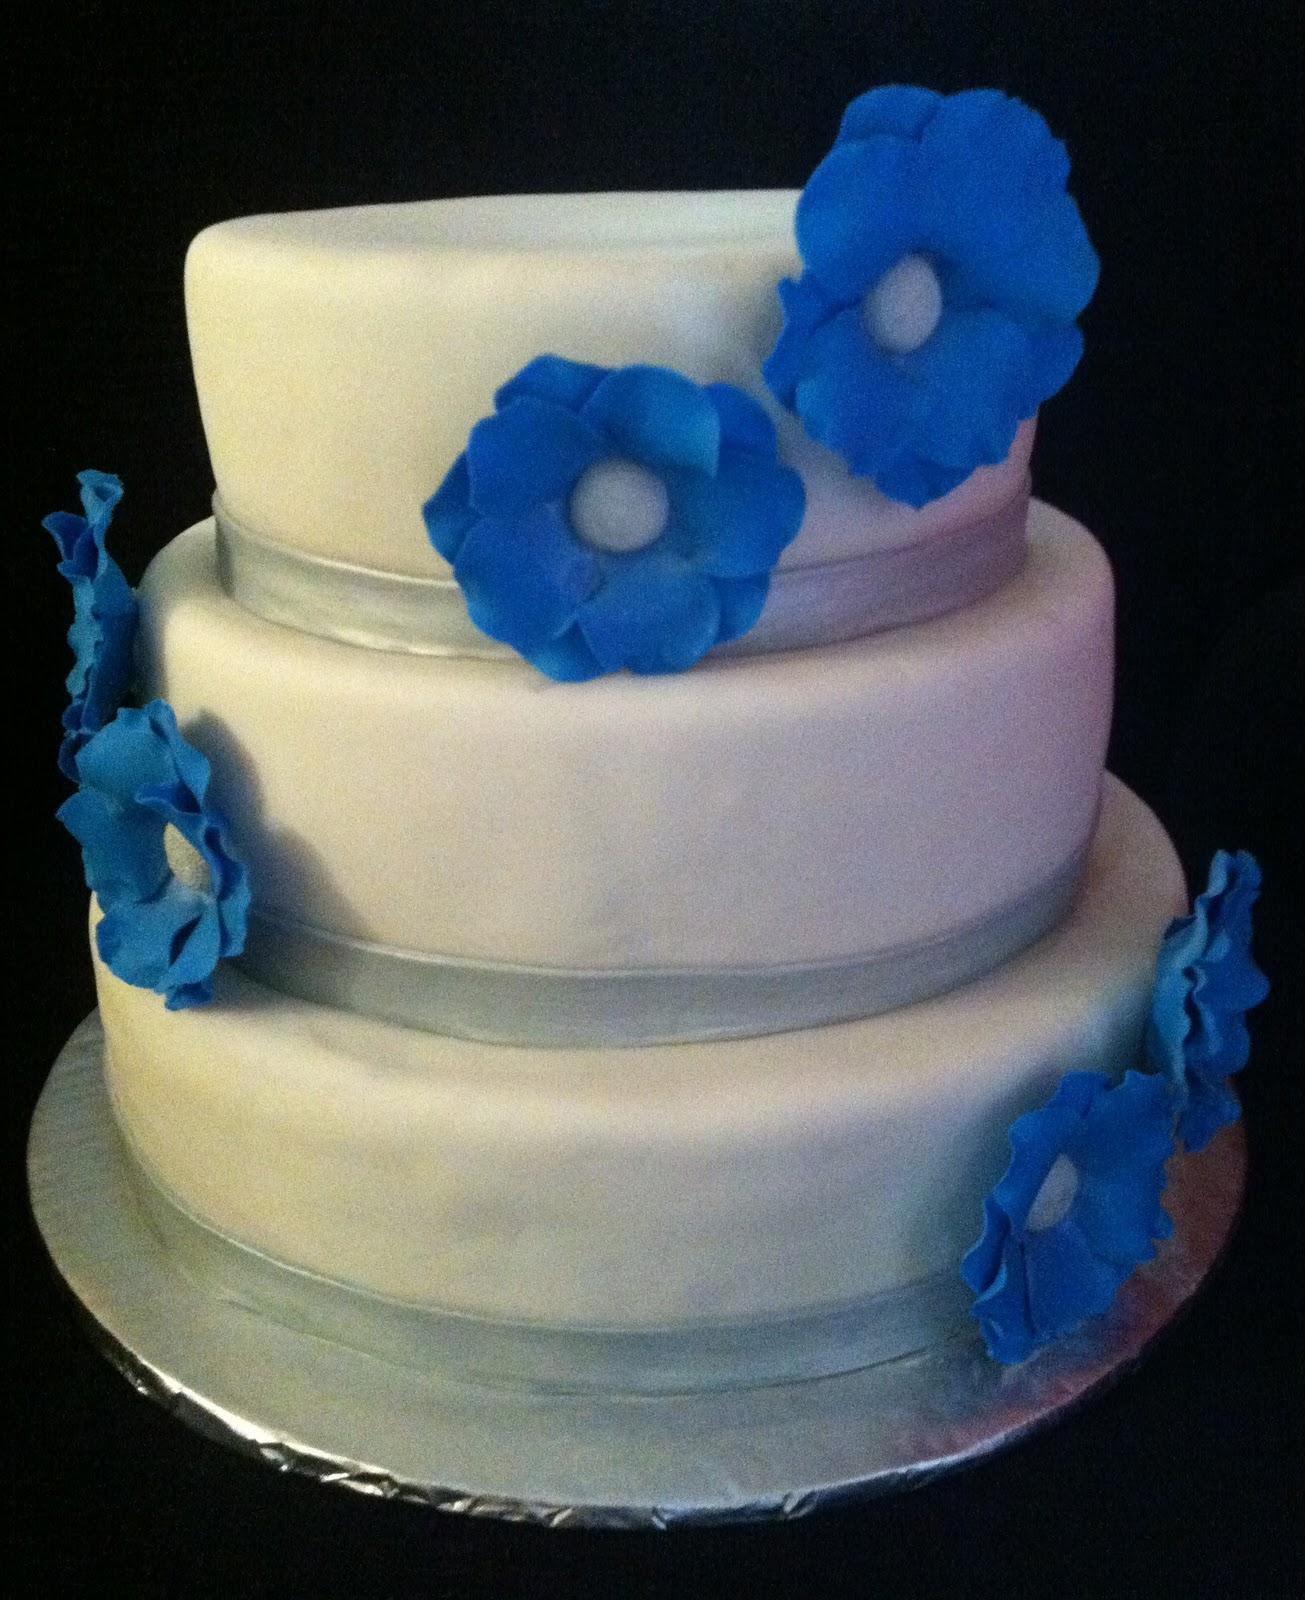 Leelees Cake abilities Winter Wedding Cake